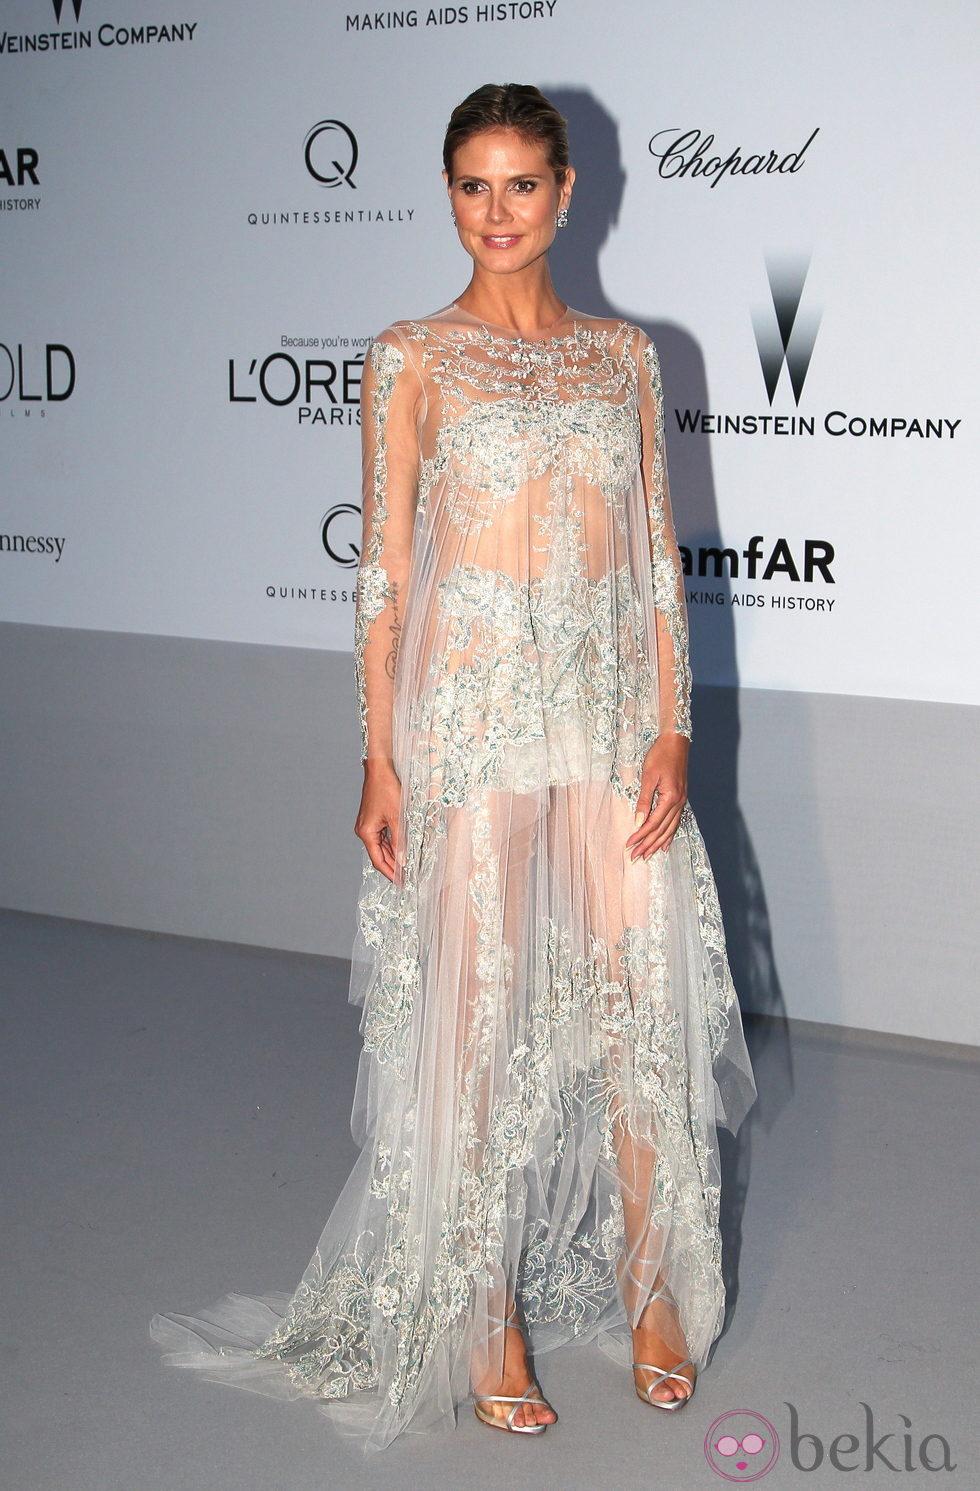 Heidi Klum en la gala amfAr celebrada en el Festival de Cannes 2012